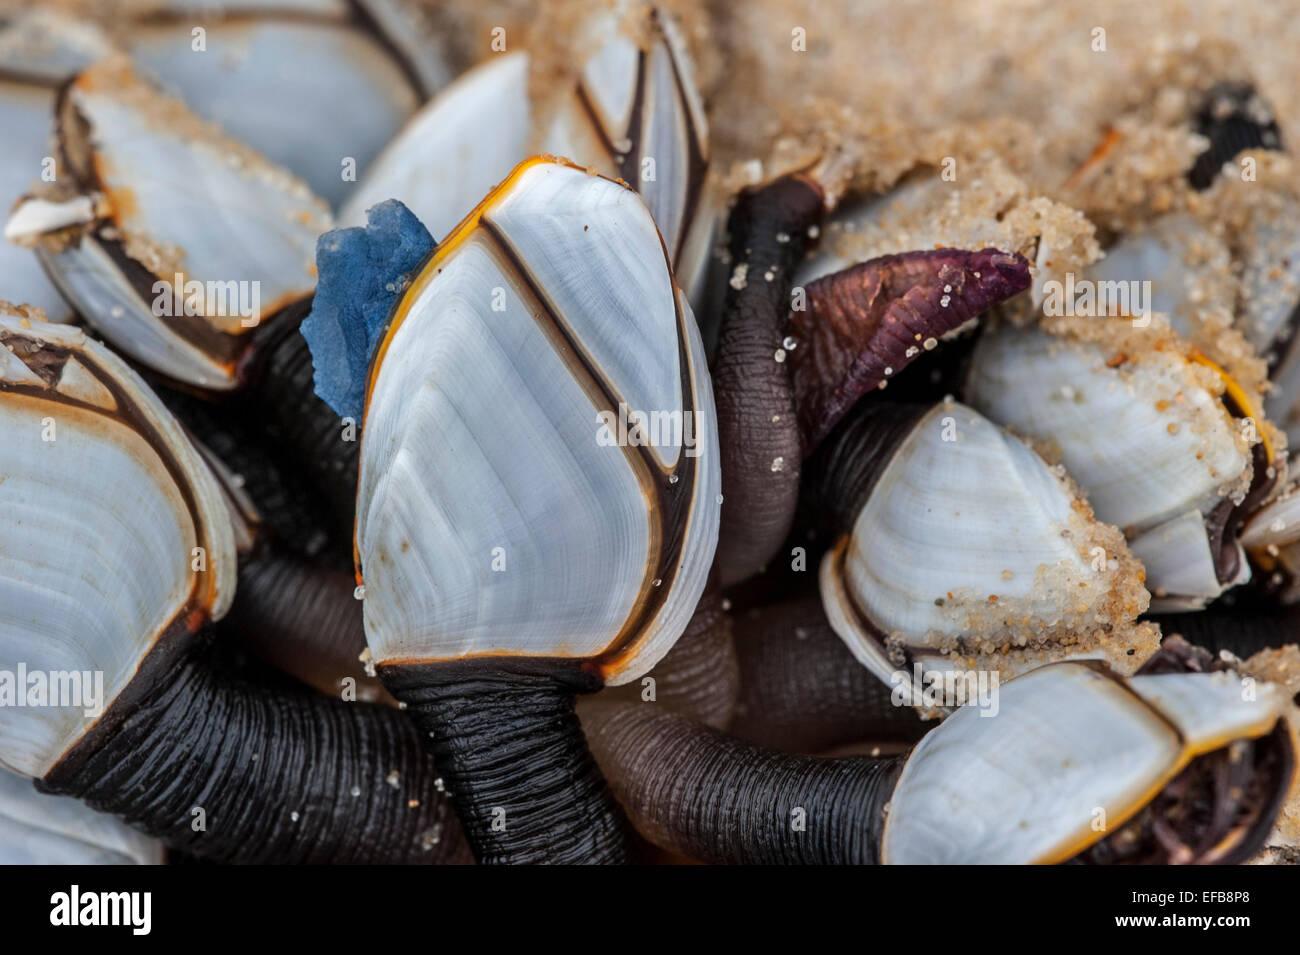 Common goose barnacles / pelagic gooseneck barnacle / smooth gooseneck barnacles (Lepas anatifera) washed on the beach Stock Photo